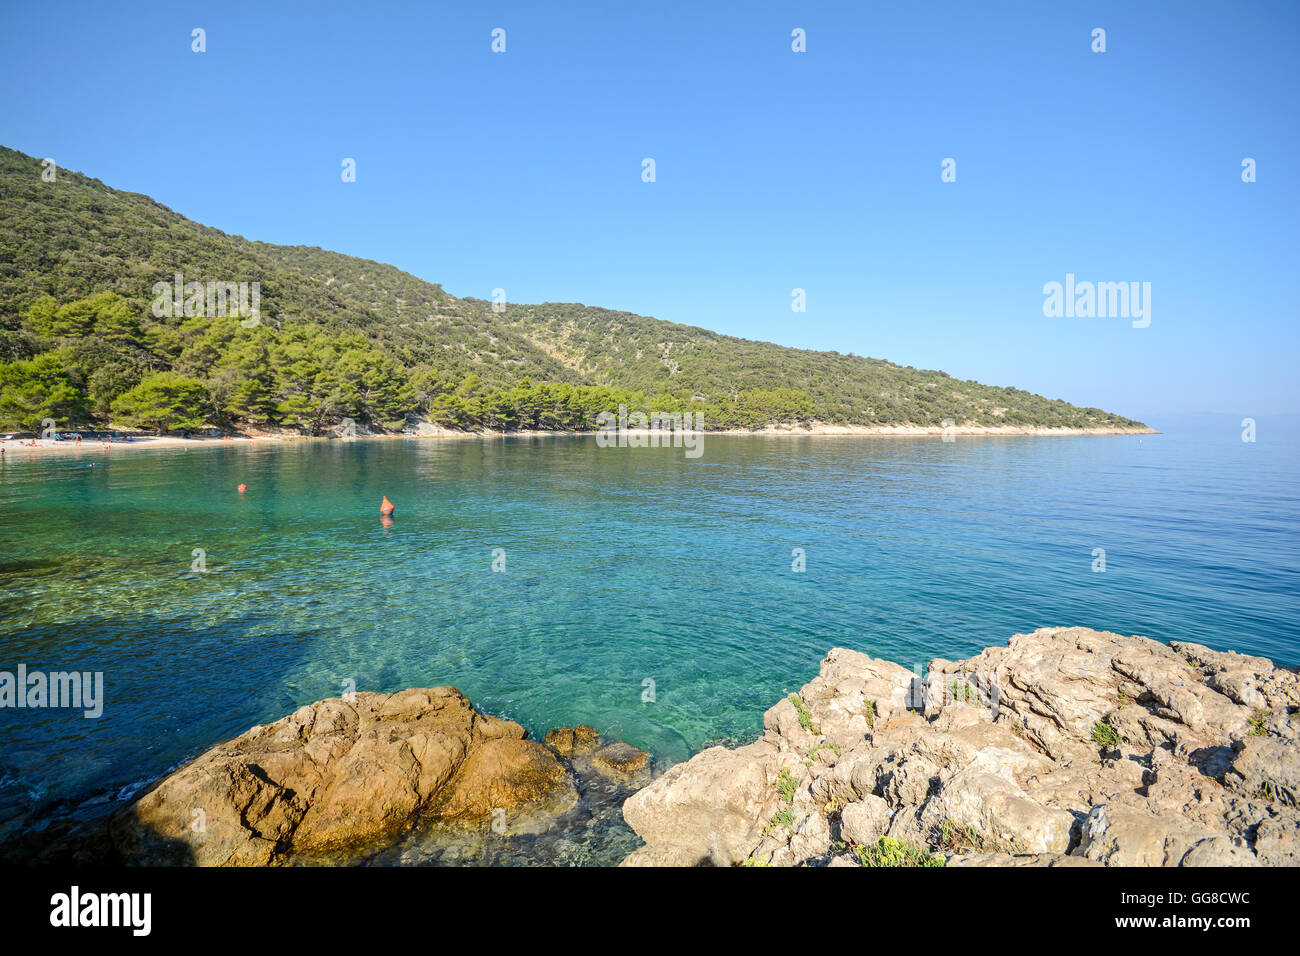 Cres Island: Beach near Valun village, Istrian coast on the Adriatic sea, Croatia Europe Stock Photo